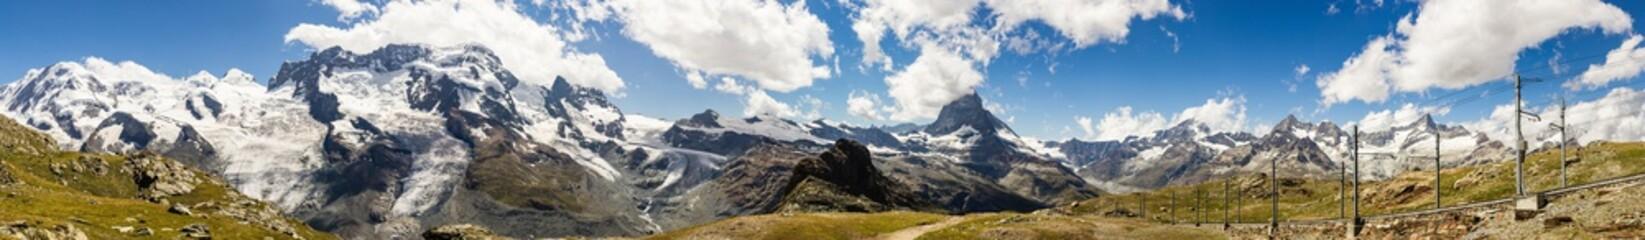 Obraz Panorama View of Pennine Alps - fototapety do salonu